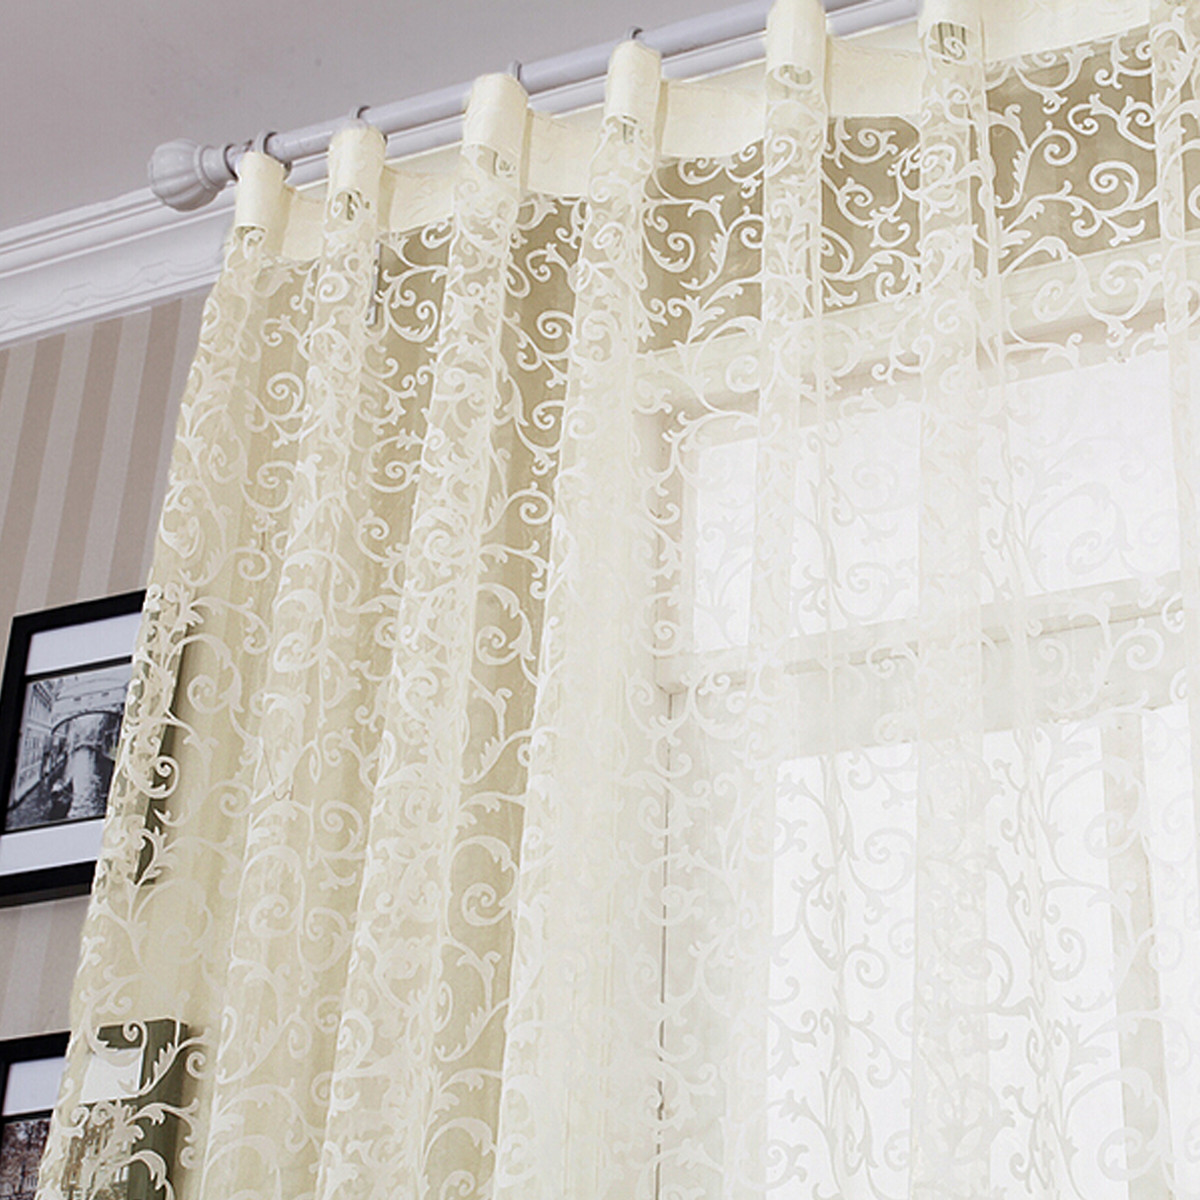 Bhs blackout curtains